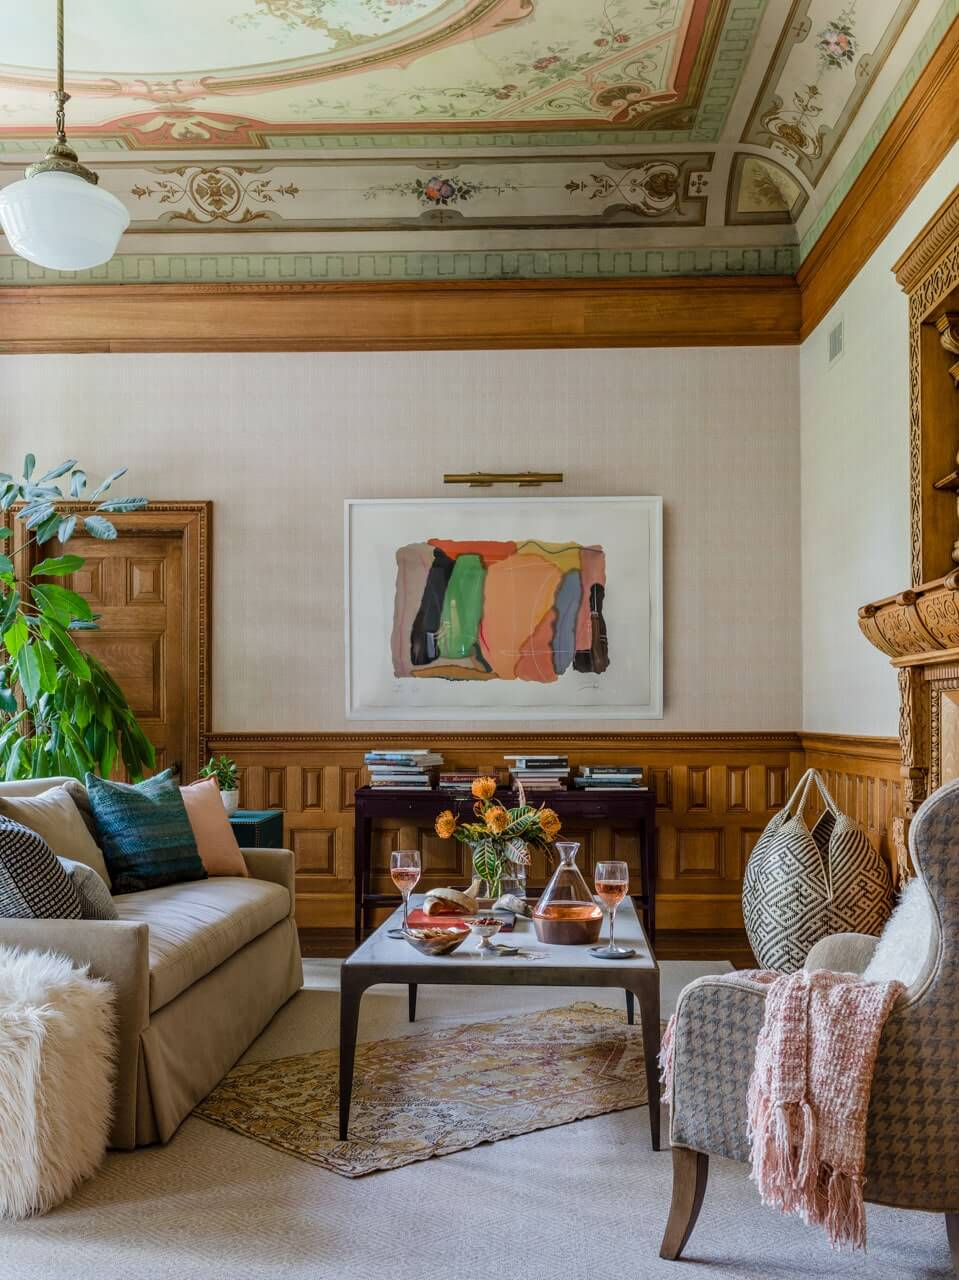 Grande Dame Queen Ann Victorian. Interior design by LeBlanc Design Interiors, Boston interior designer